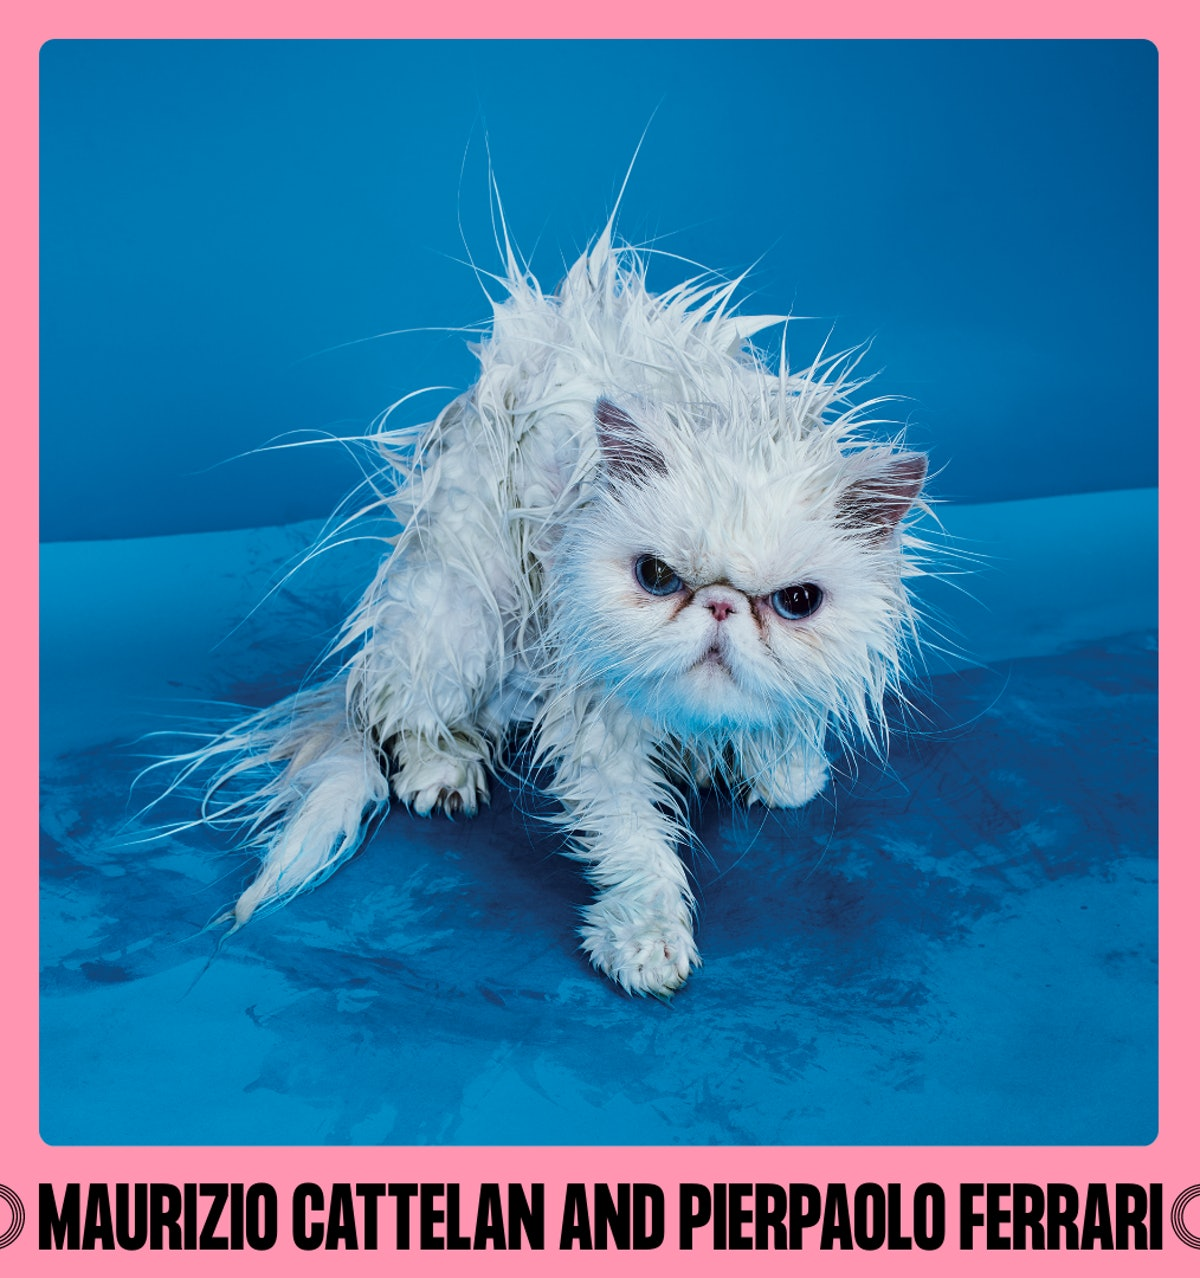 MAURIZIO CATTELAN AND PIERPAOLO FERRARI Card for Double Dutch